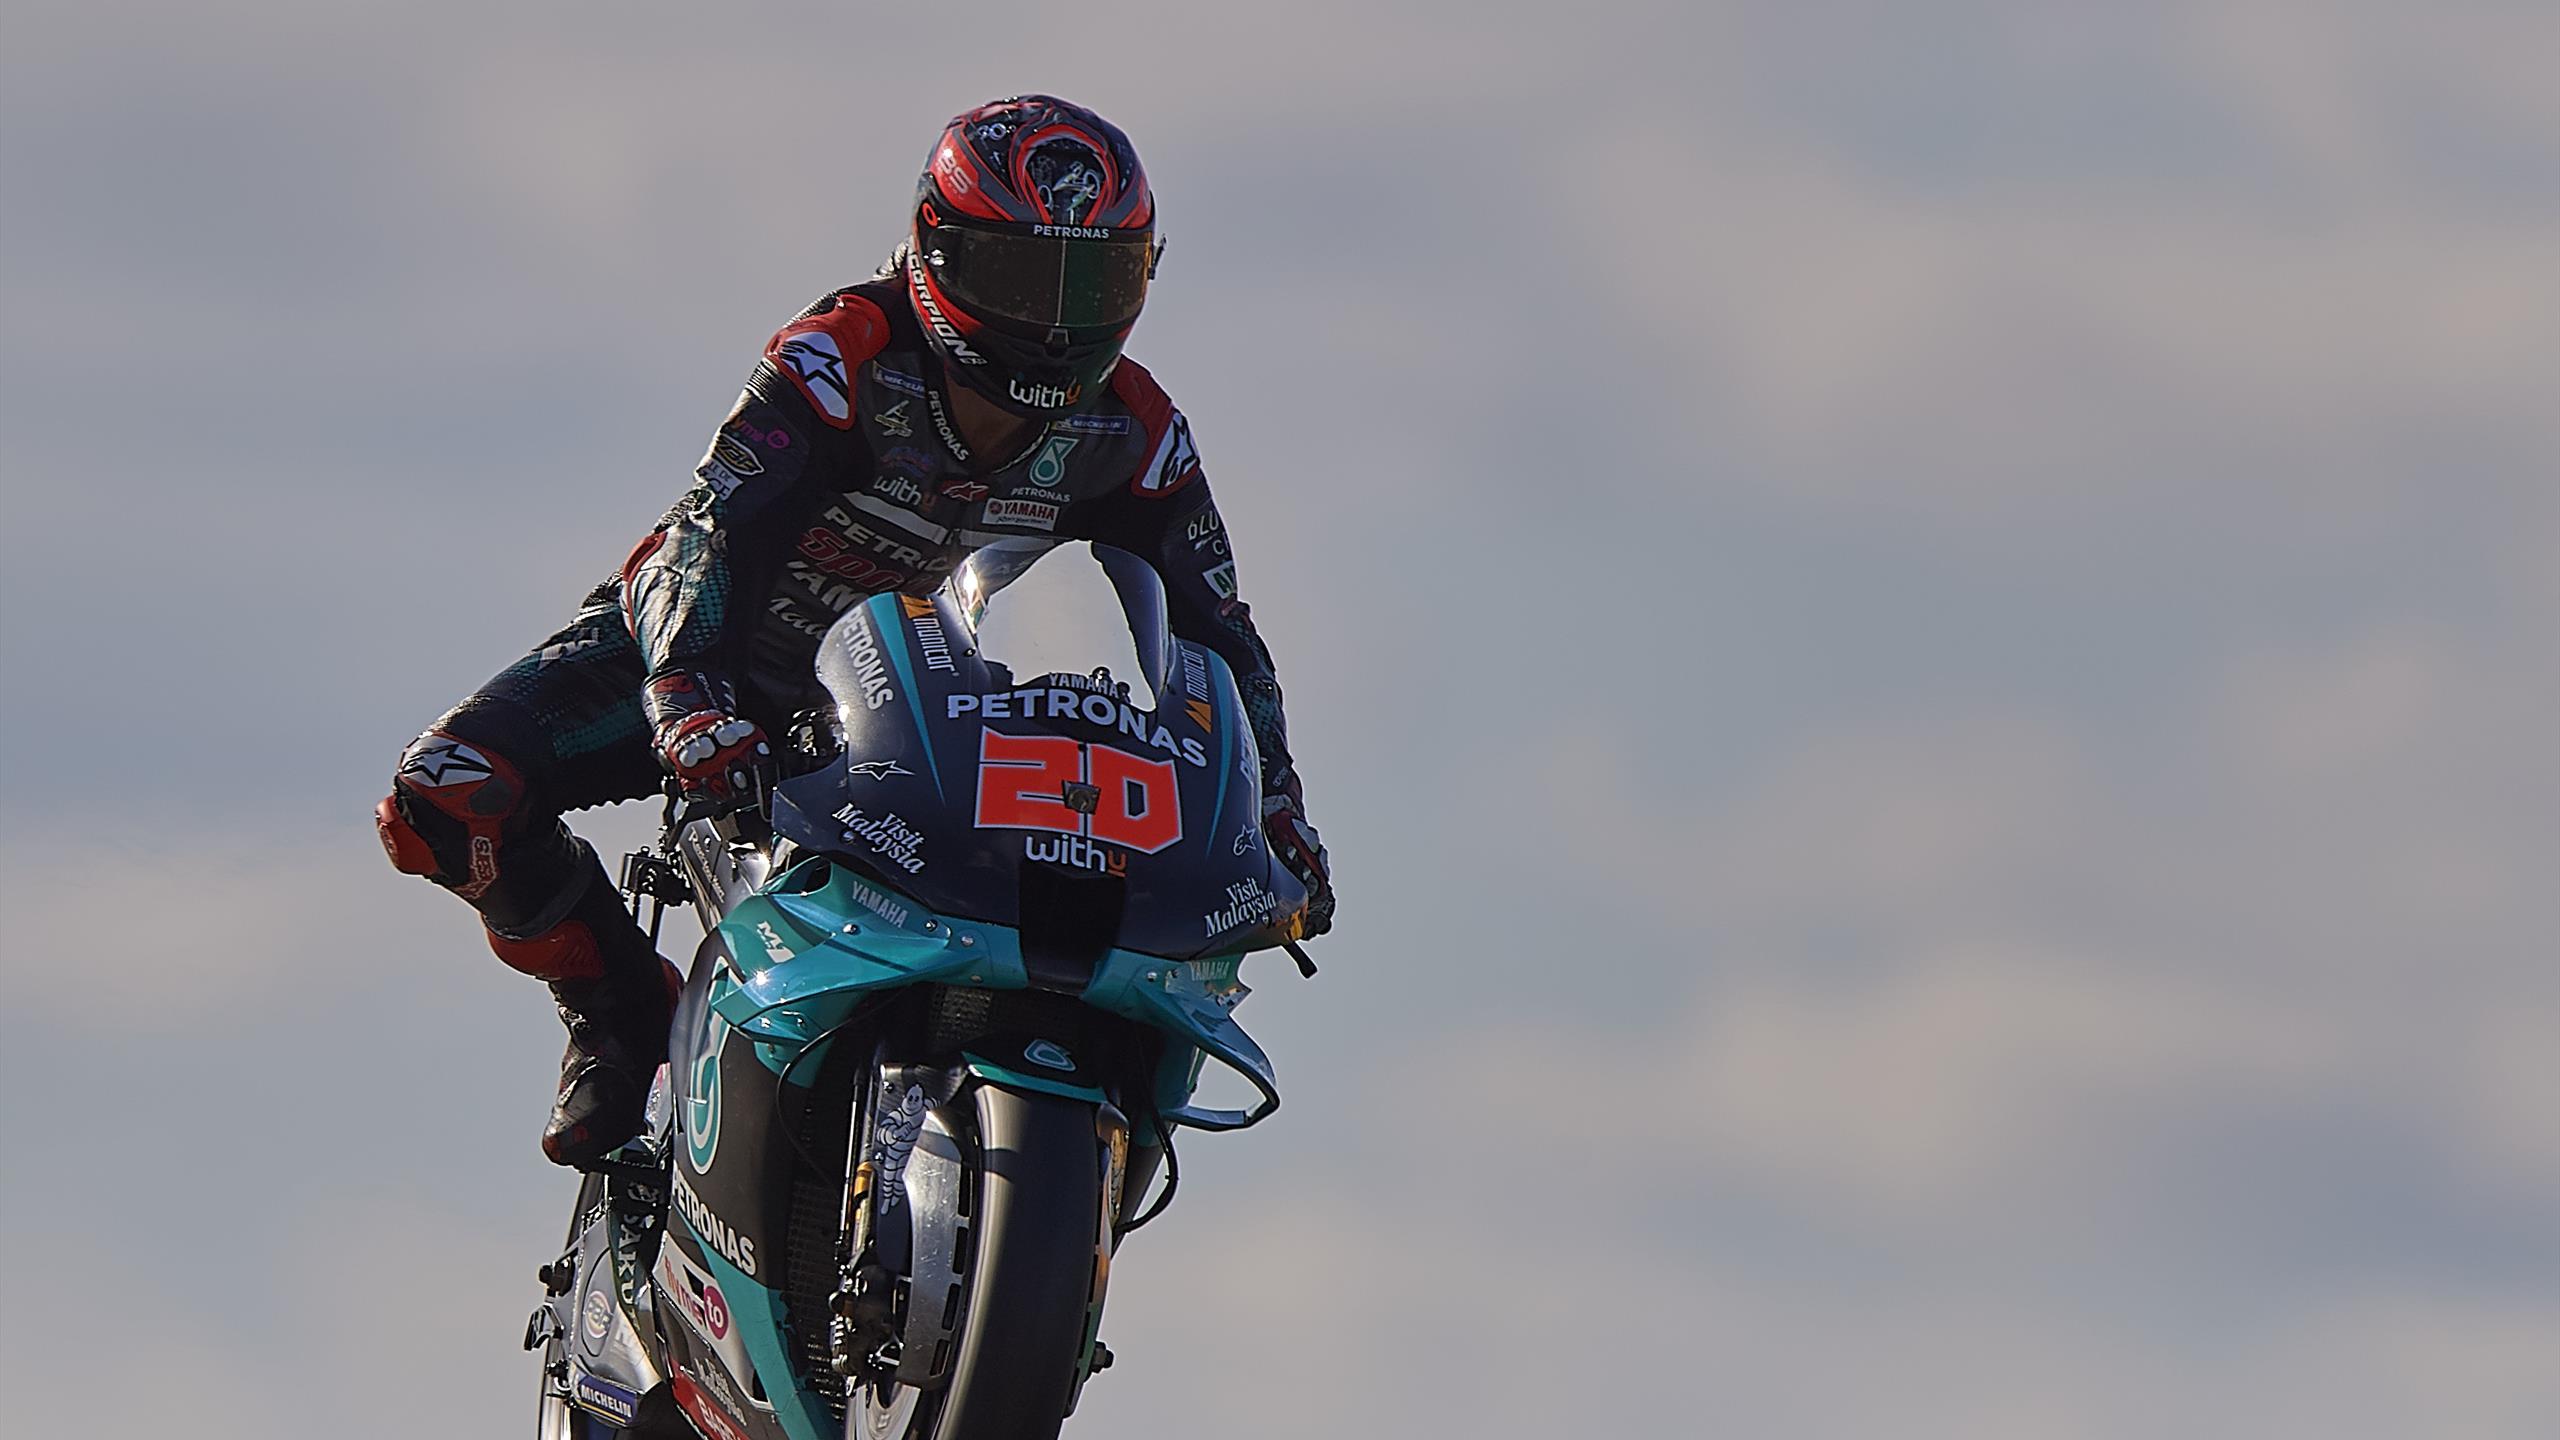 MotoGP - Fabio Quartararo (Yamaha Petronas SRT), les raisons d'une grosse déconvenue - Eurosport